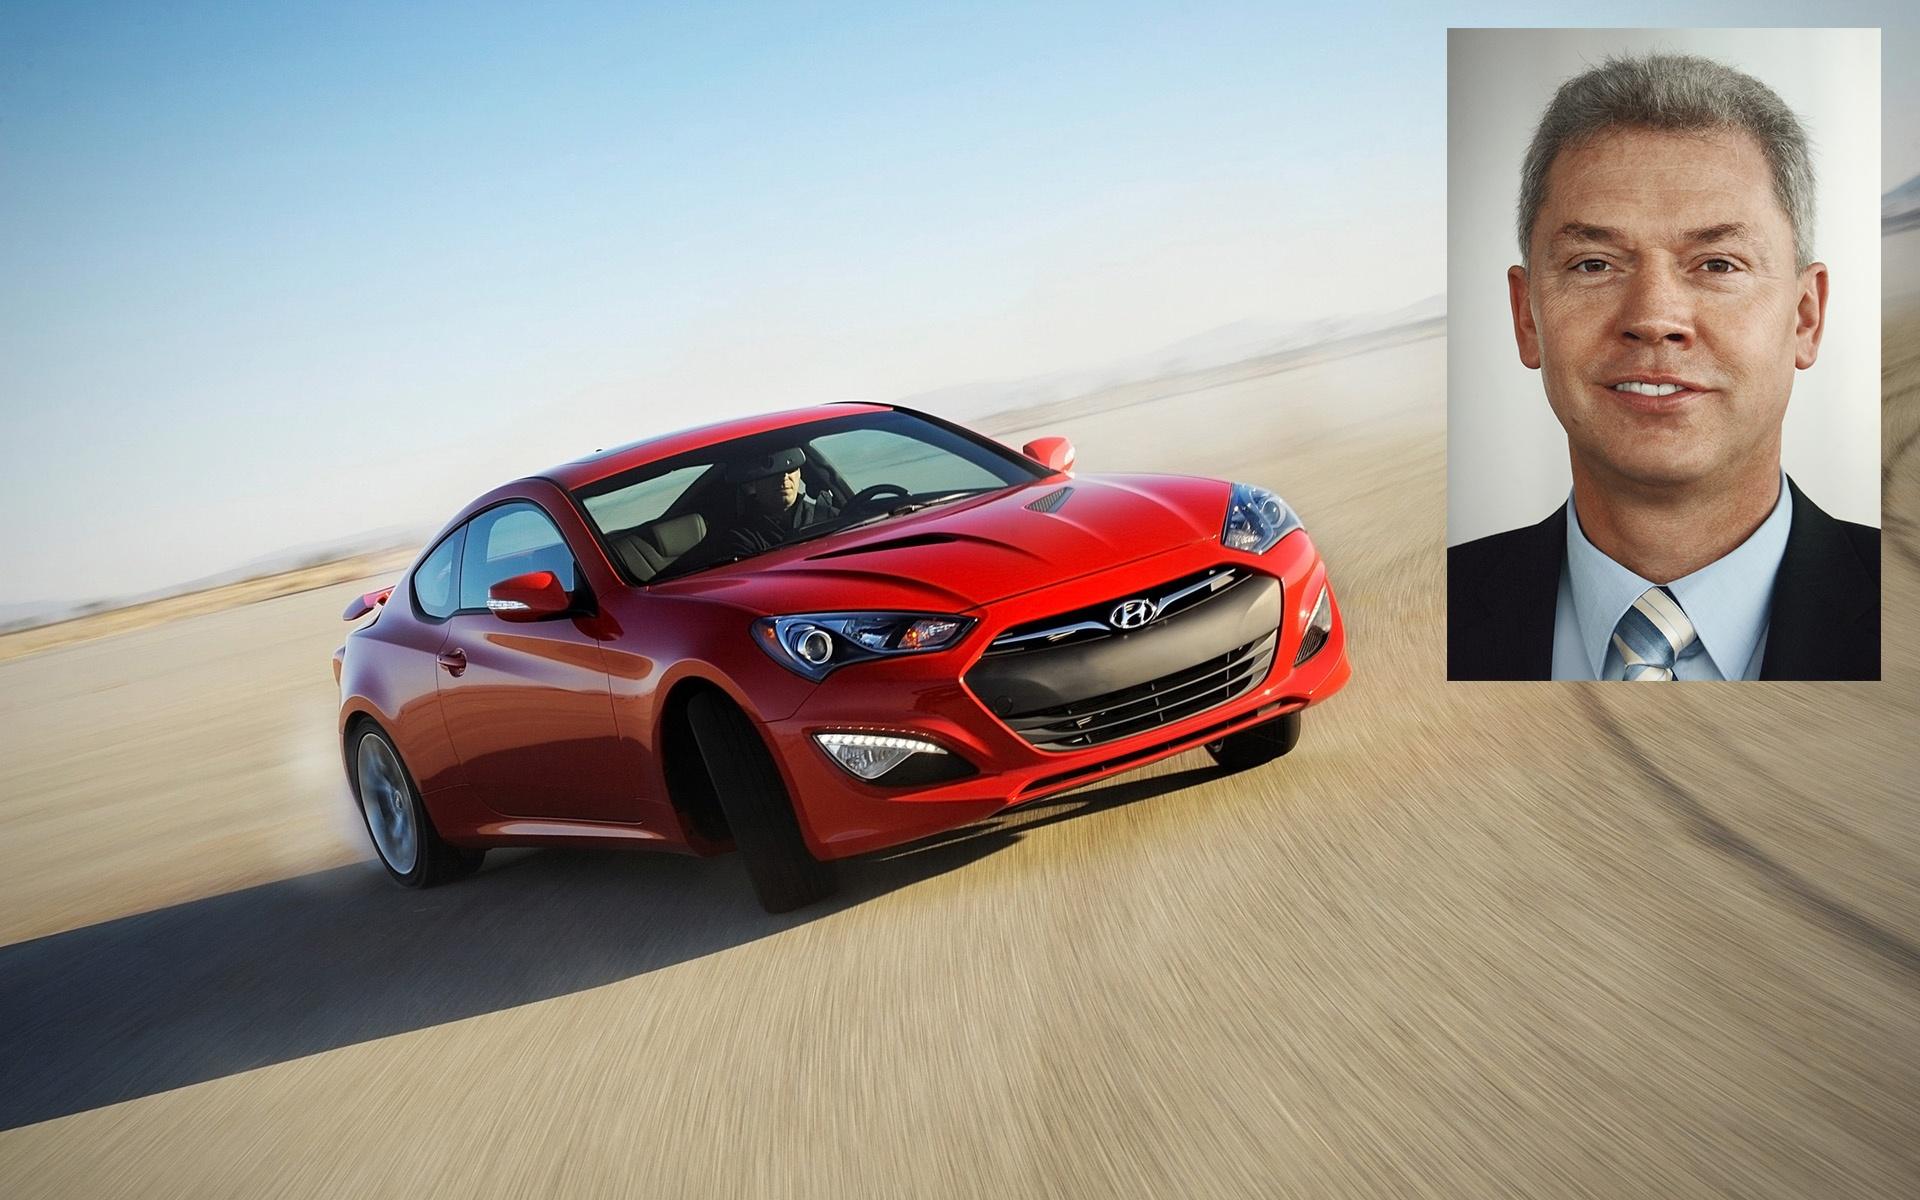 2015-Hyundai-Genesis-Coupe-Red-Motion-1-1920x1200